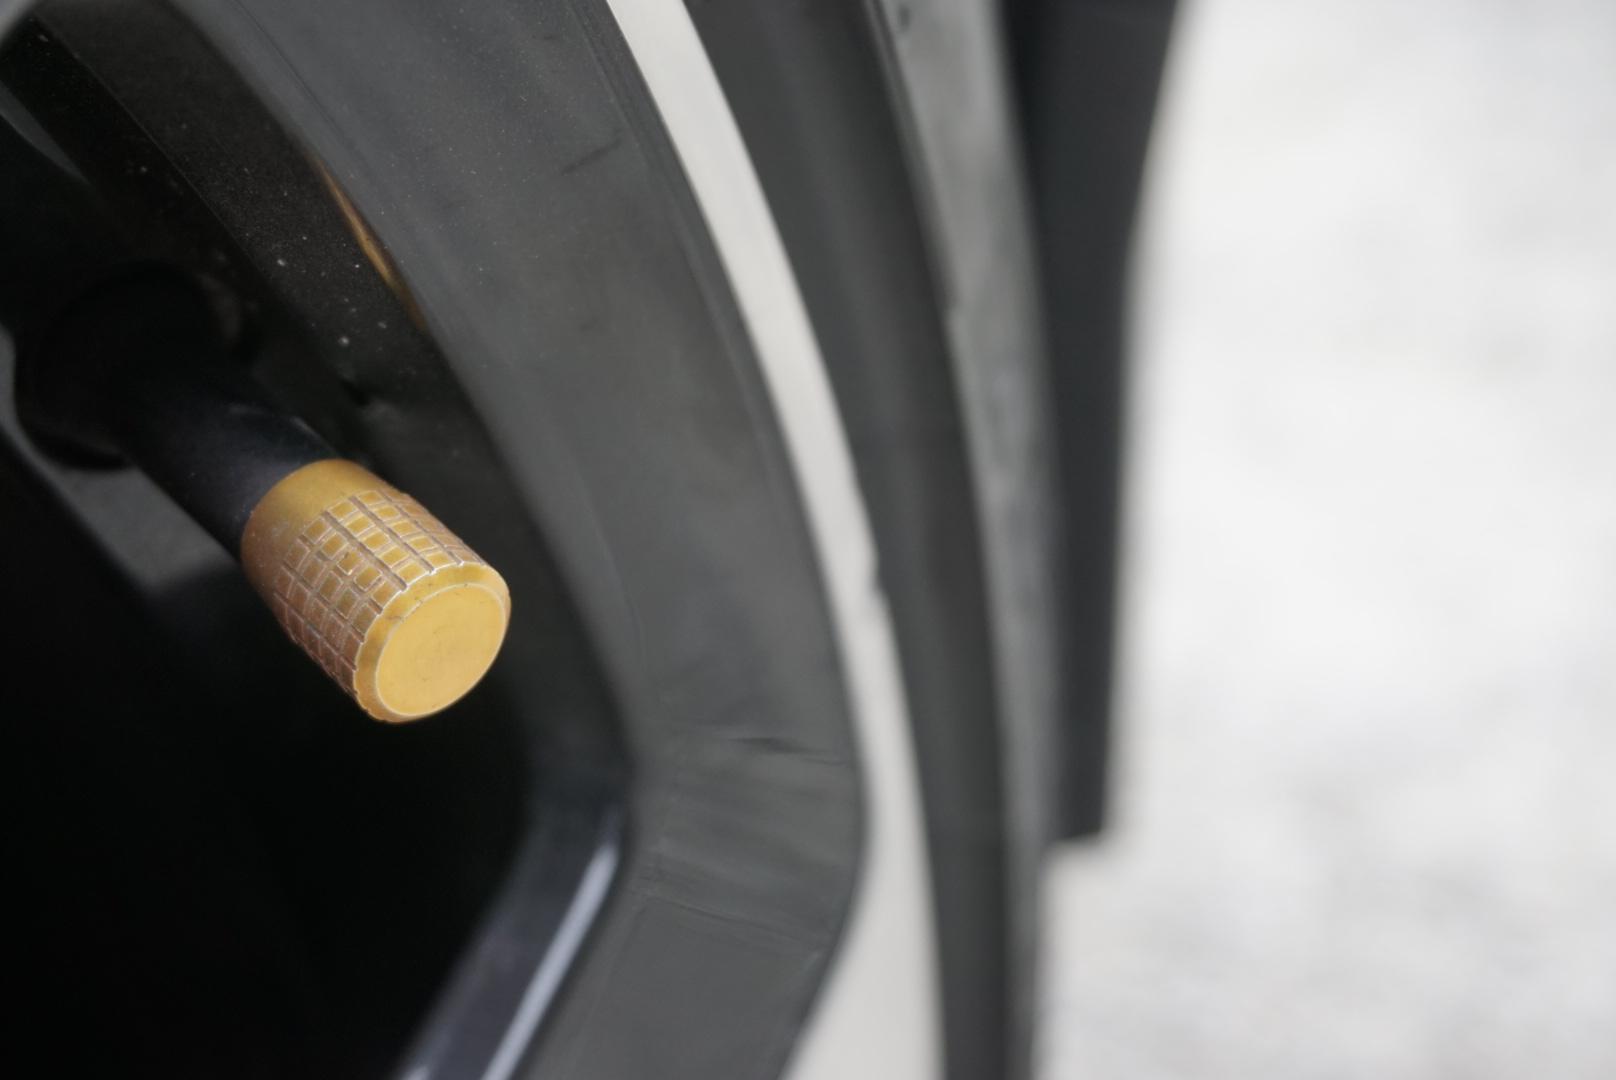 Polestar 2 wheel and tire valve stem close